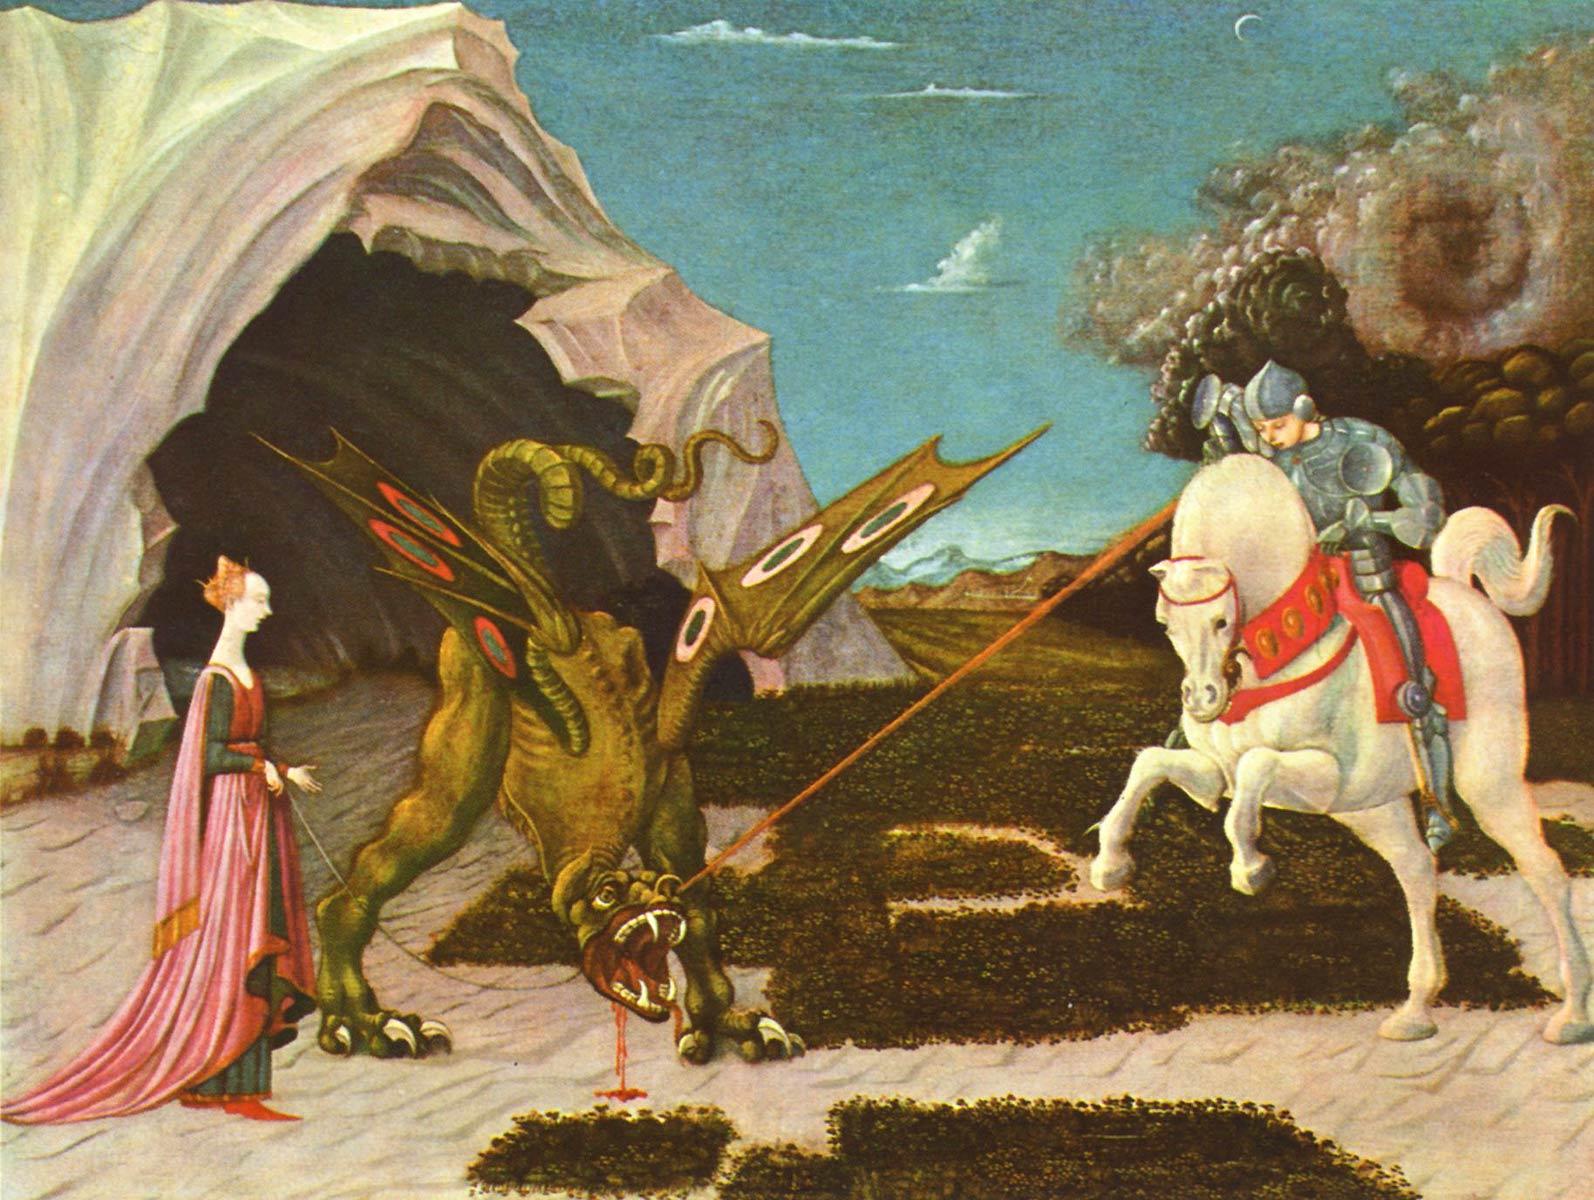 Drachen | Mittelalter Wiki | FANDOM powered by Wikia